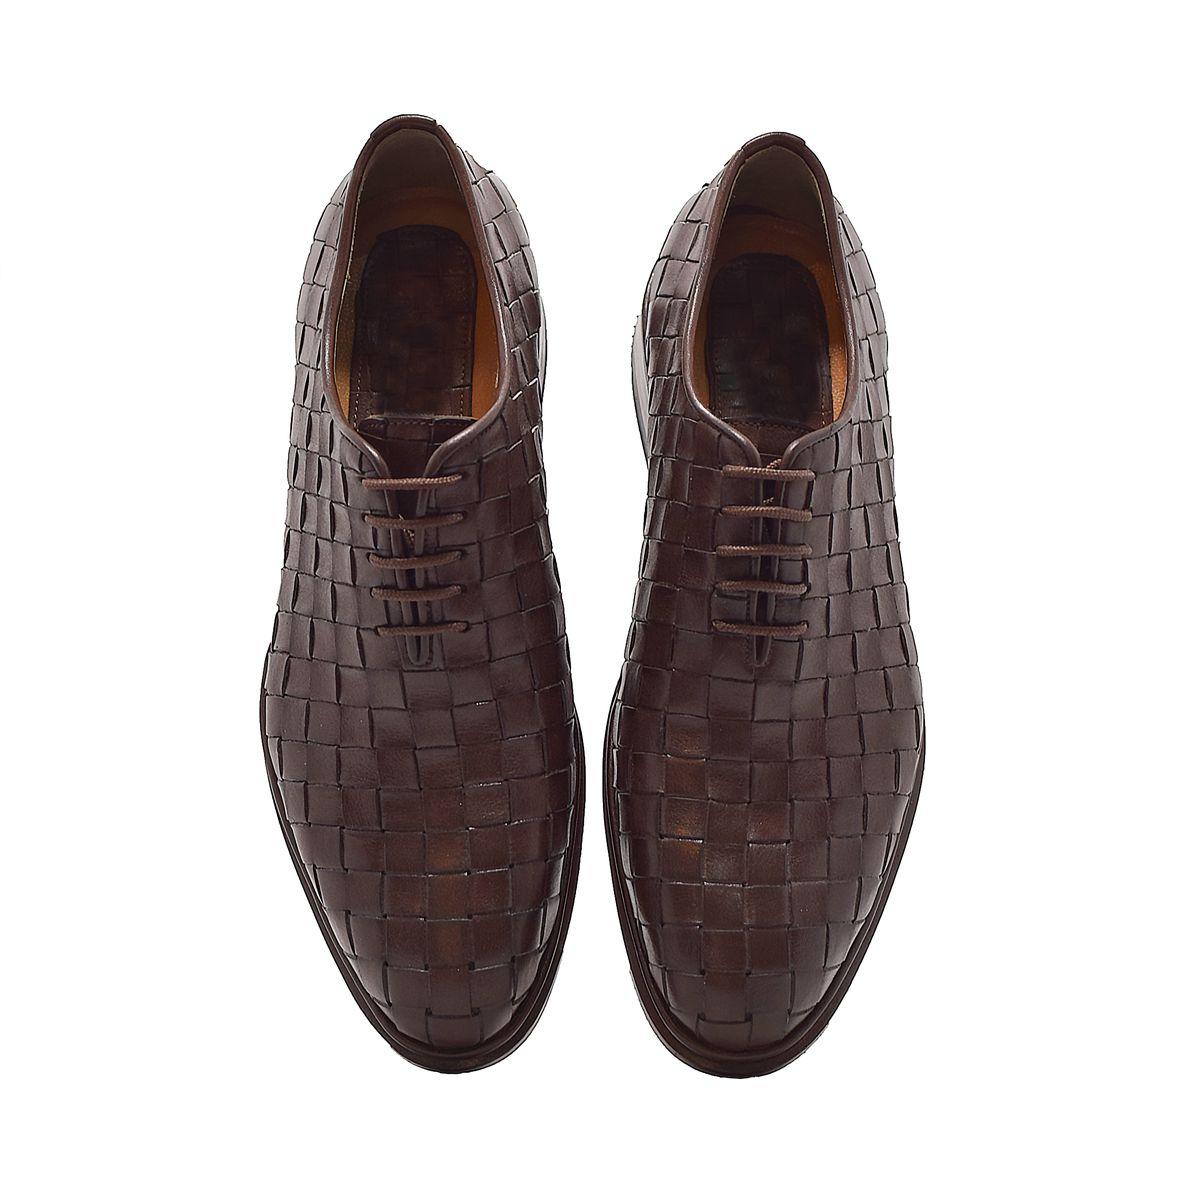 کفش مردانه دگرمان مدل بوریا کد deg.2br2102 -  - 6